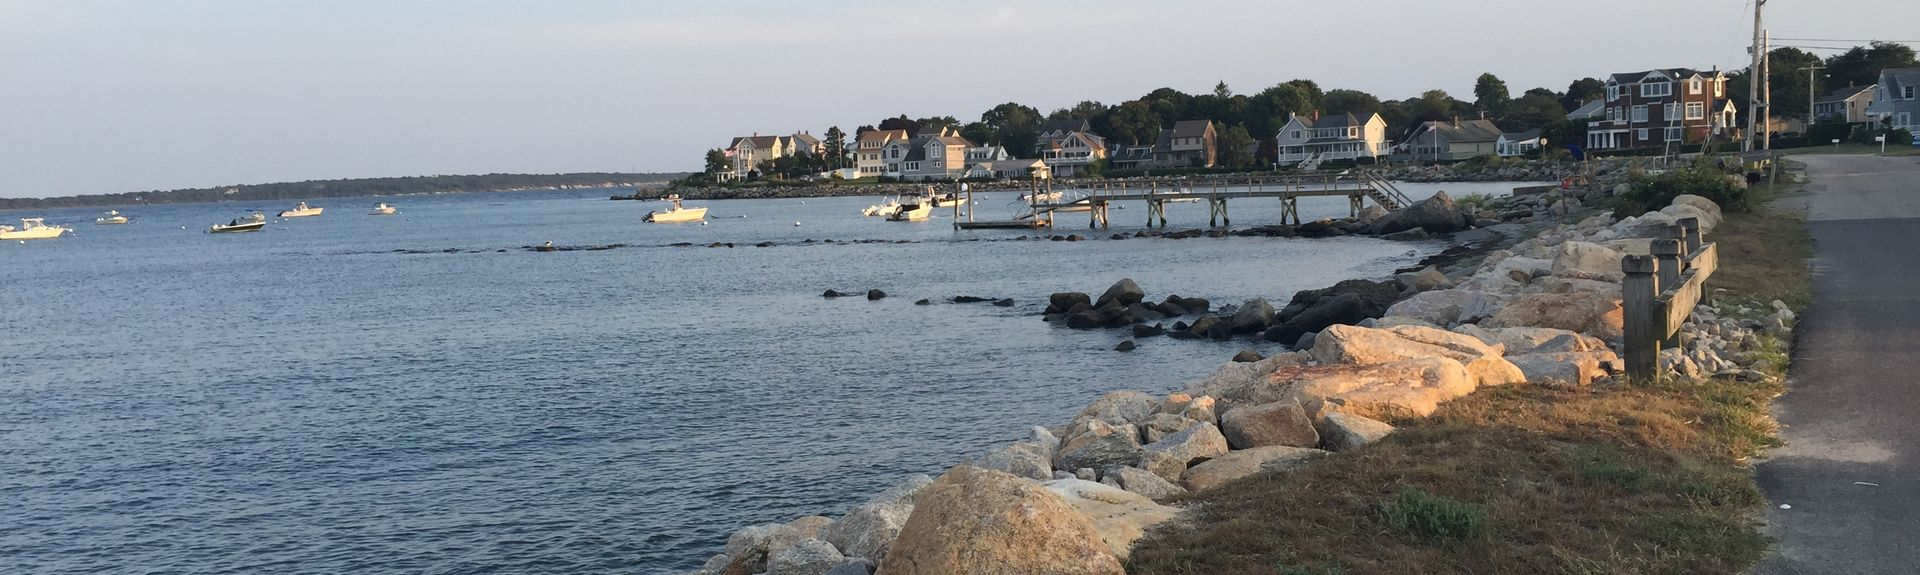 Roger W. Wheeler State Beach, Narragansett, Rhode Island, United States of America